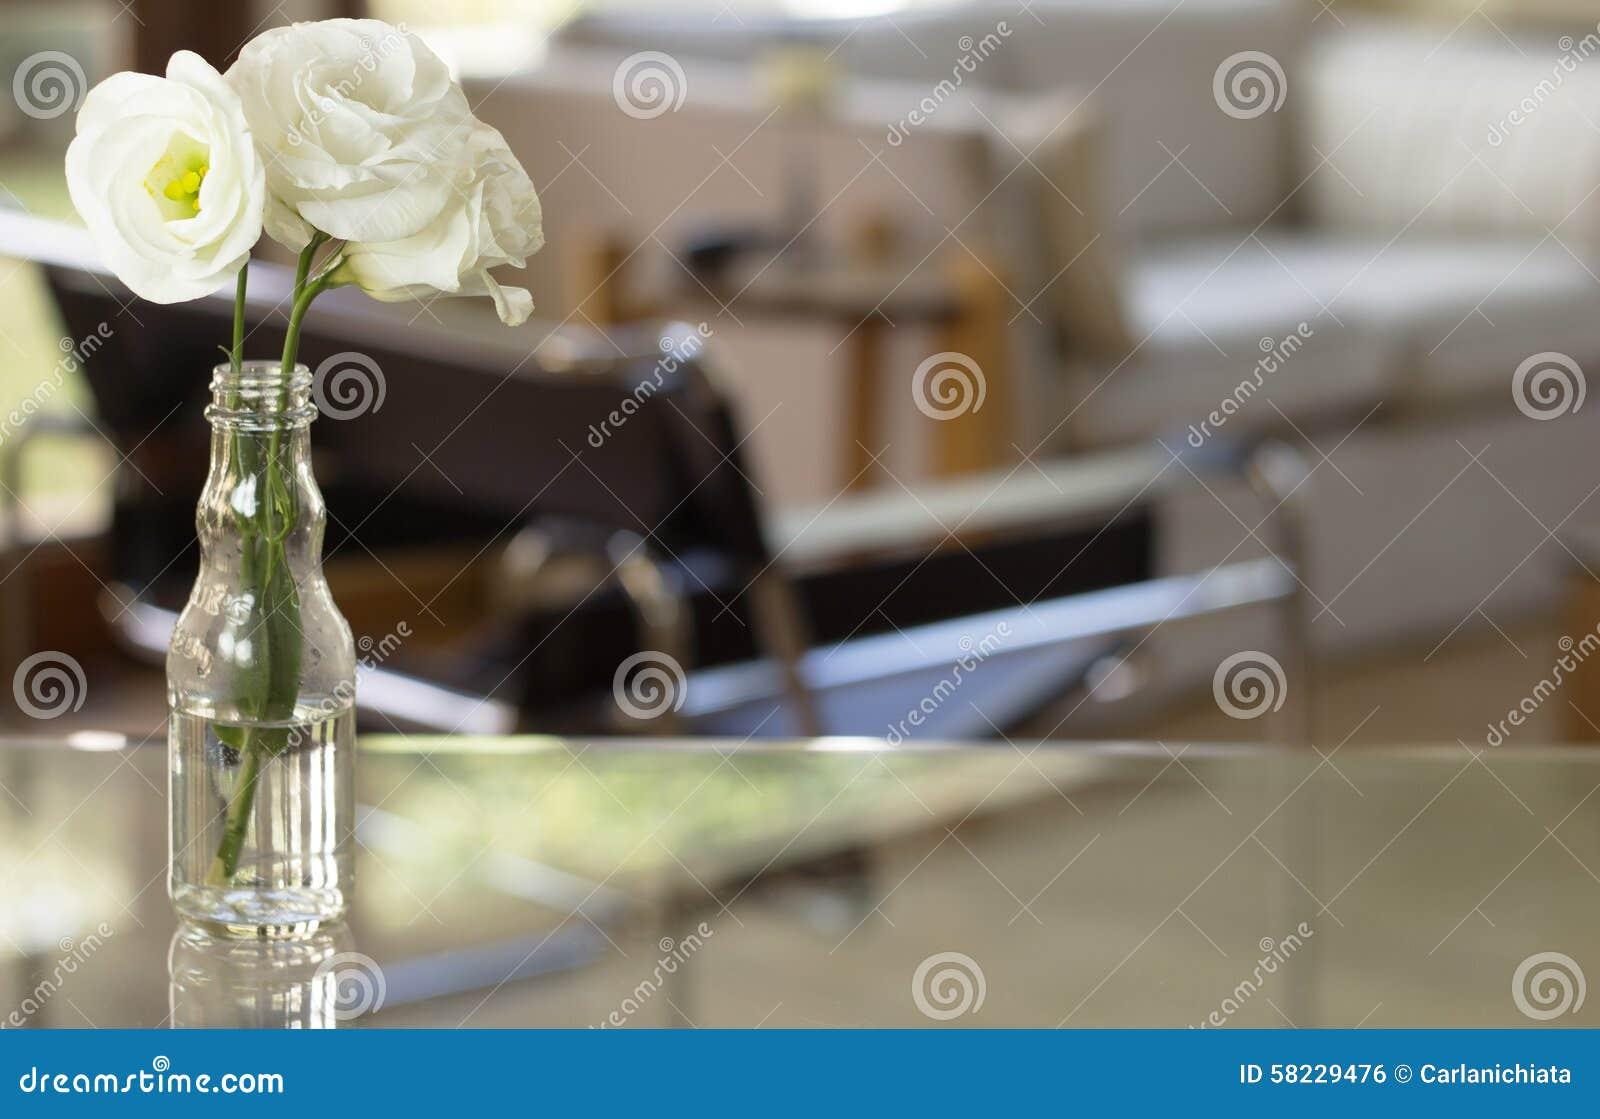 Blommor PÃ¥ Vardagsrum Arkivfoto - Bild: 58229476